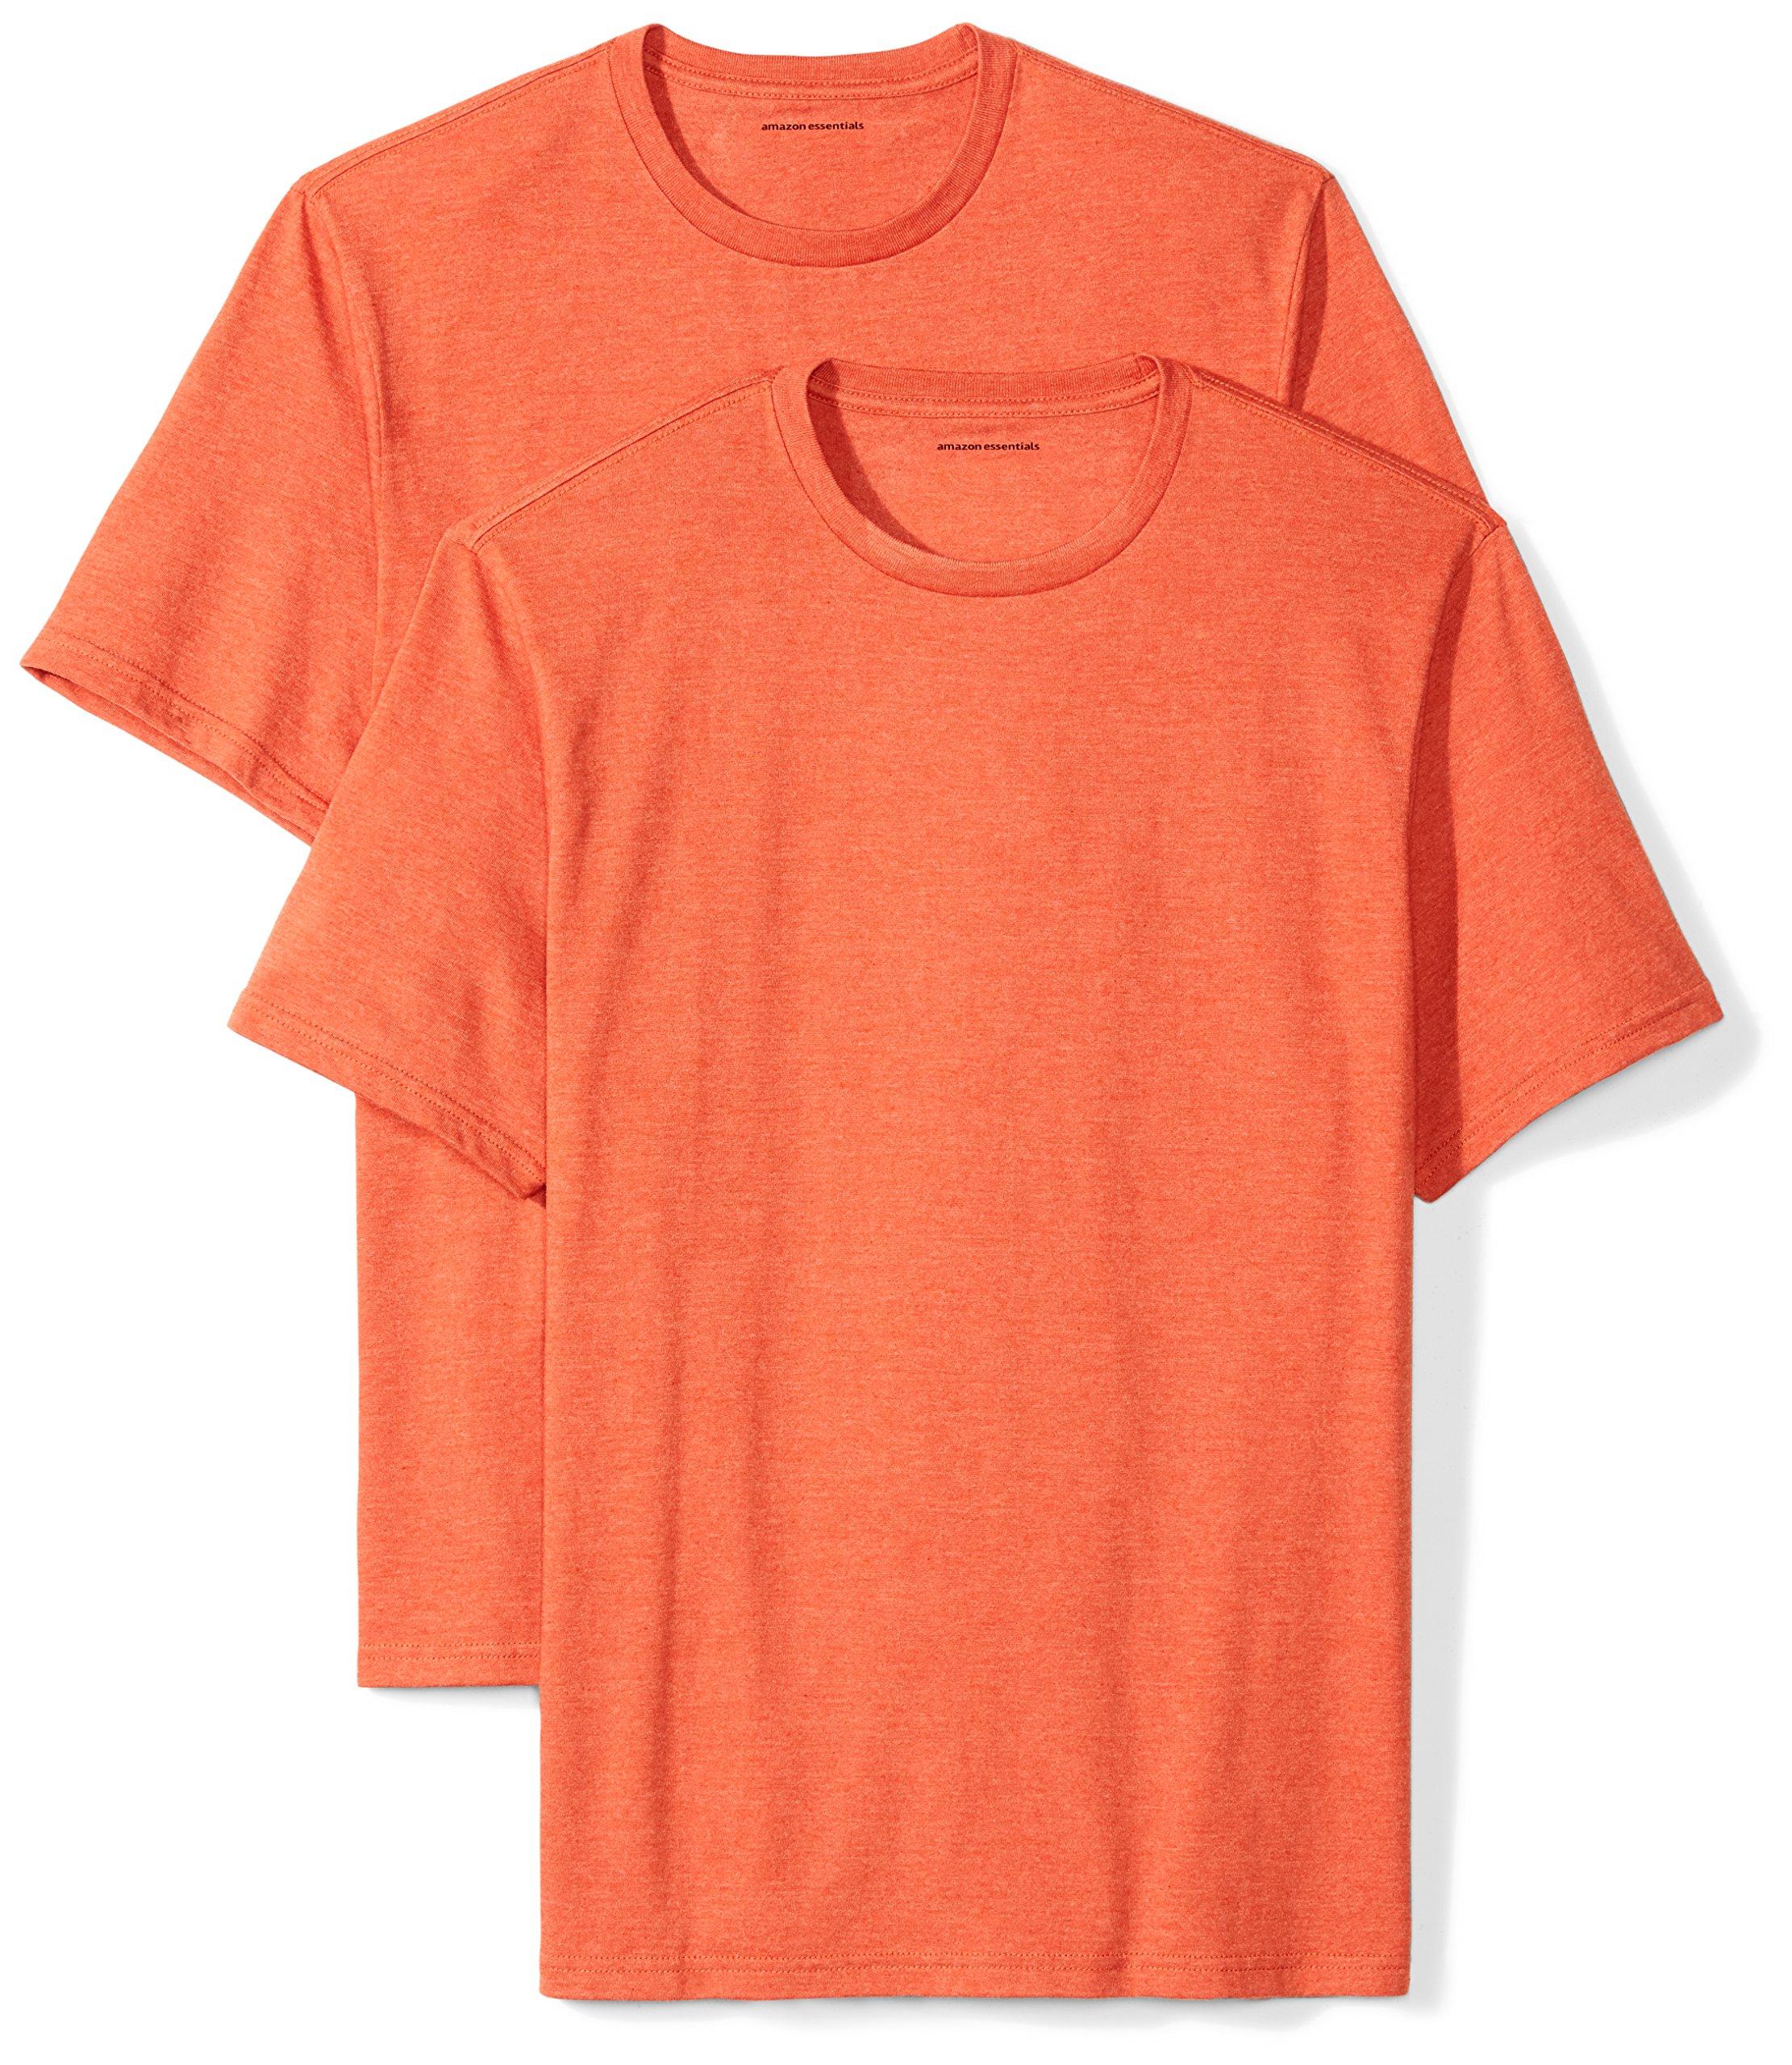 Amazon Essentials Men's 2-Pack Loose-Fit Short-Sleeve Crewneck T-Shirts, Orange Heather, X-Large